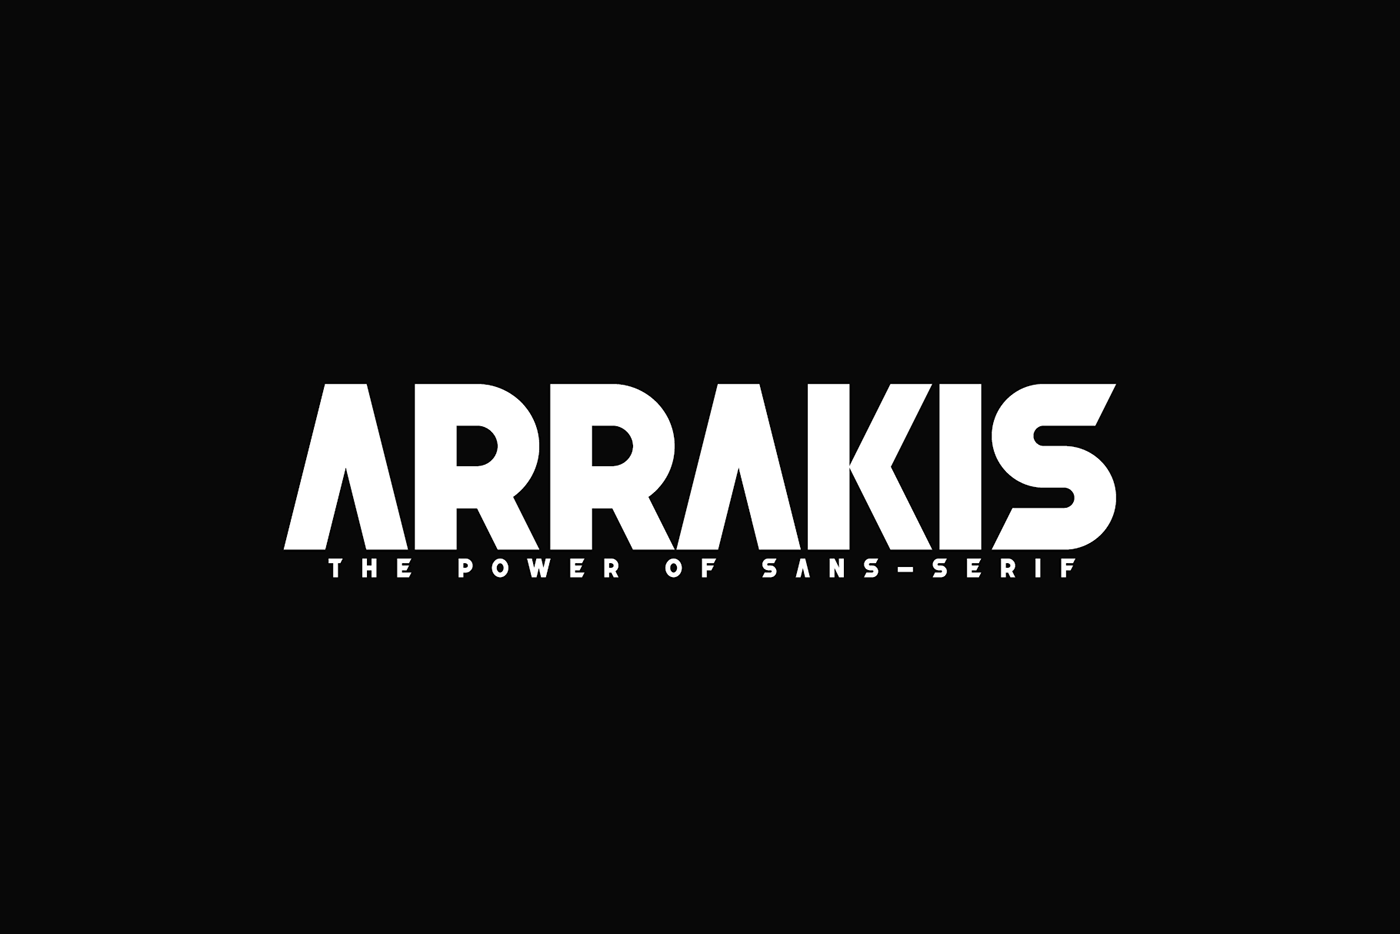 Arrakis Free Font - sans-serif